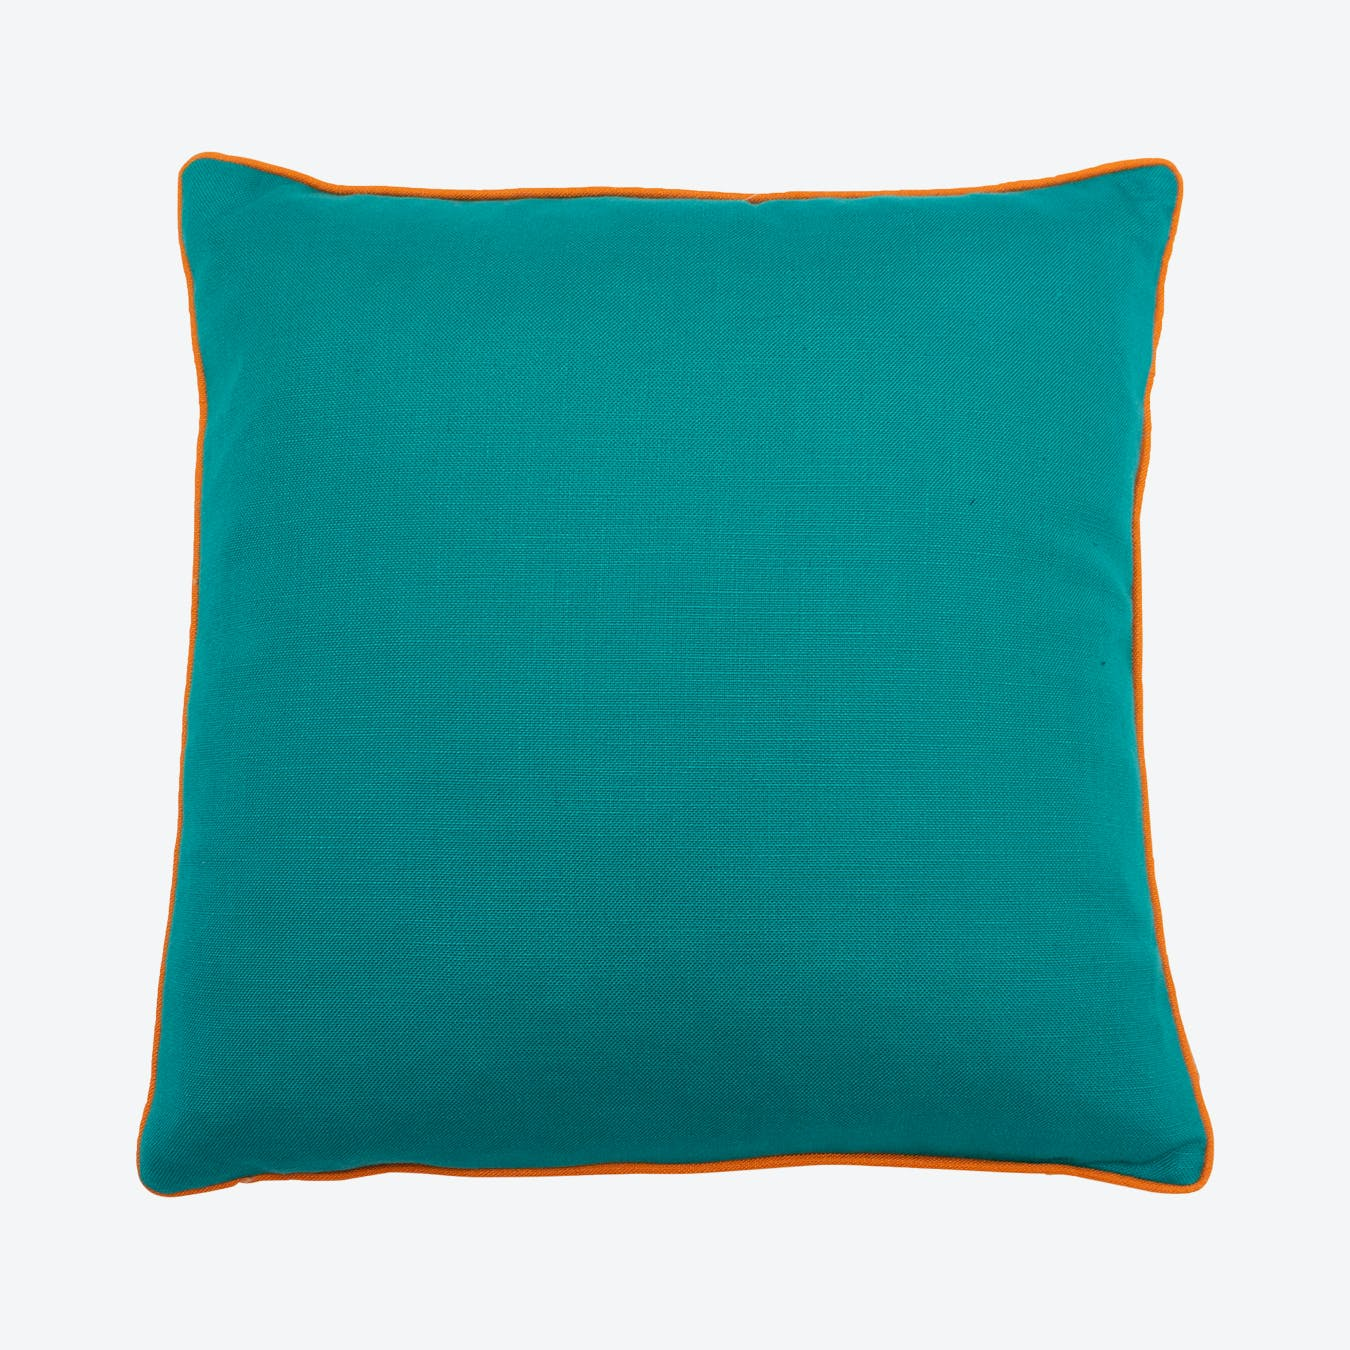 Home Lives Bamboo Pillowcase Cover